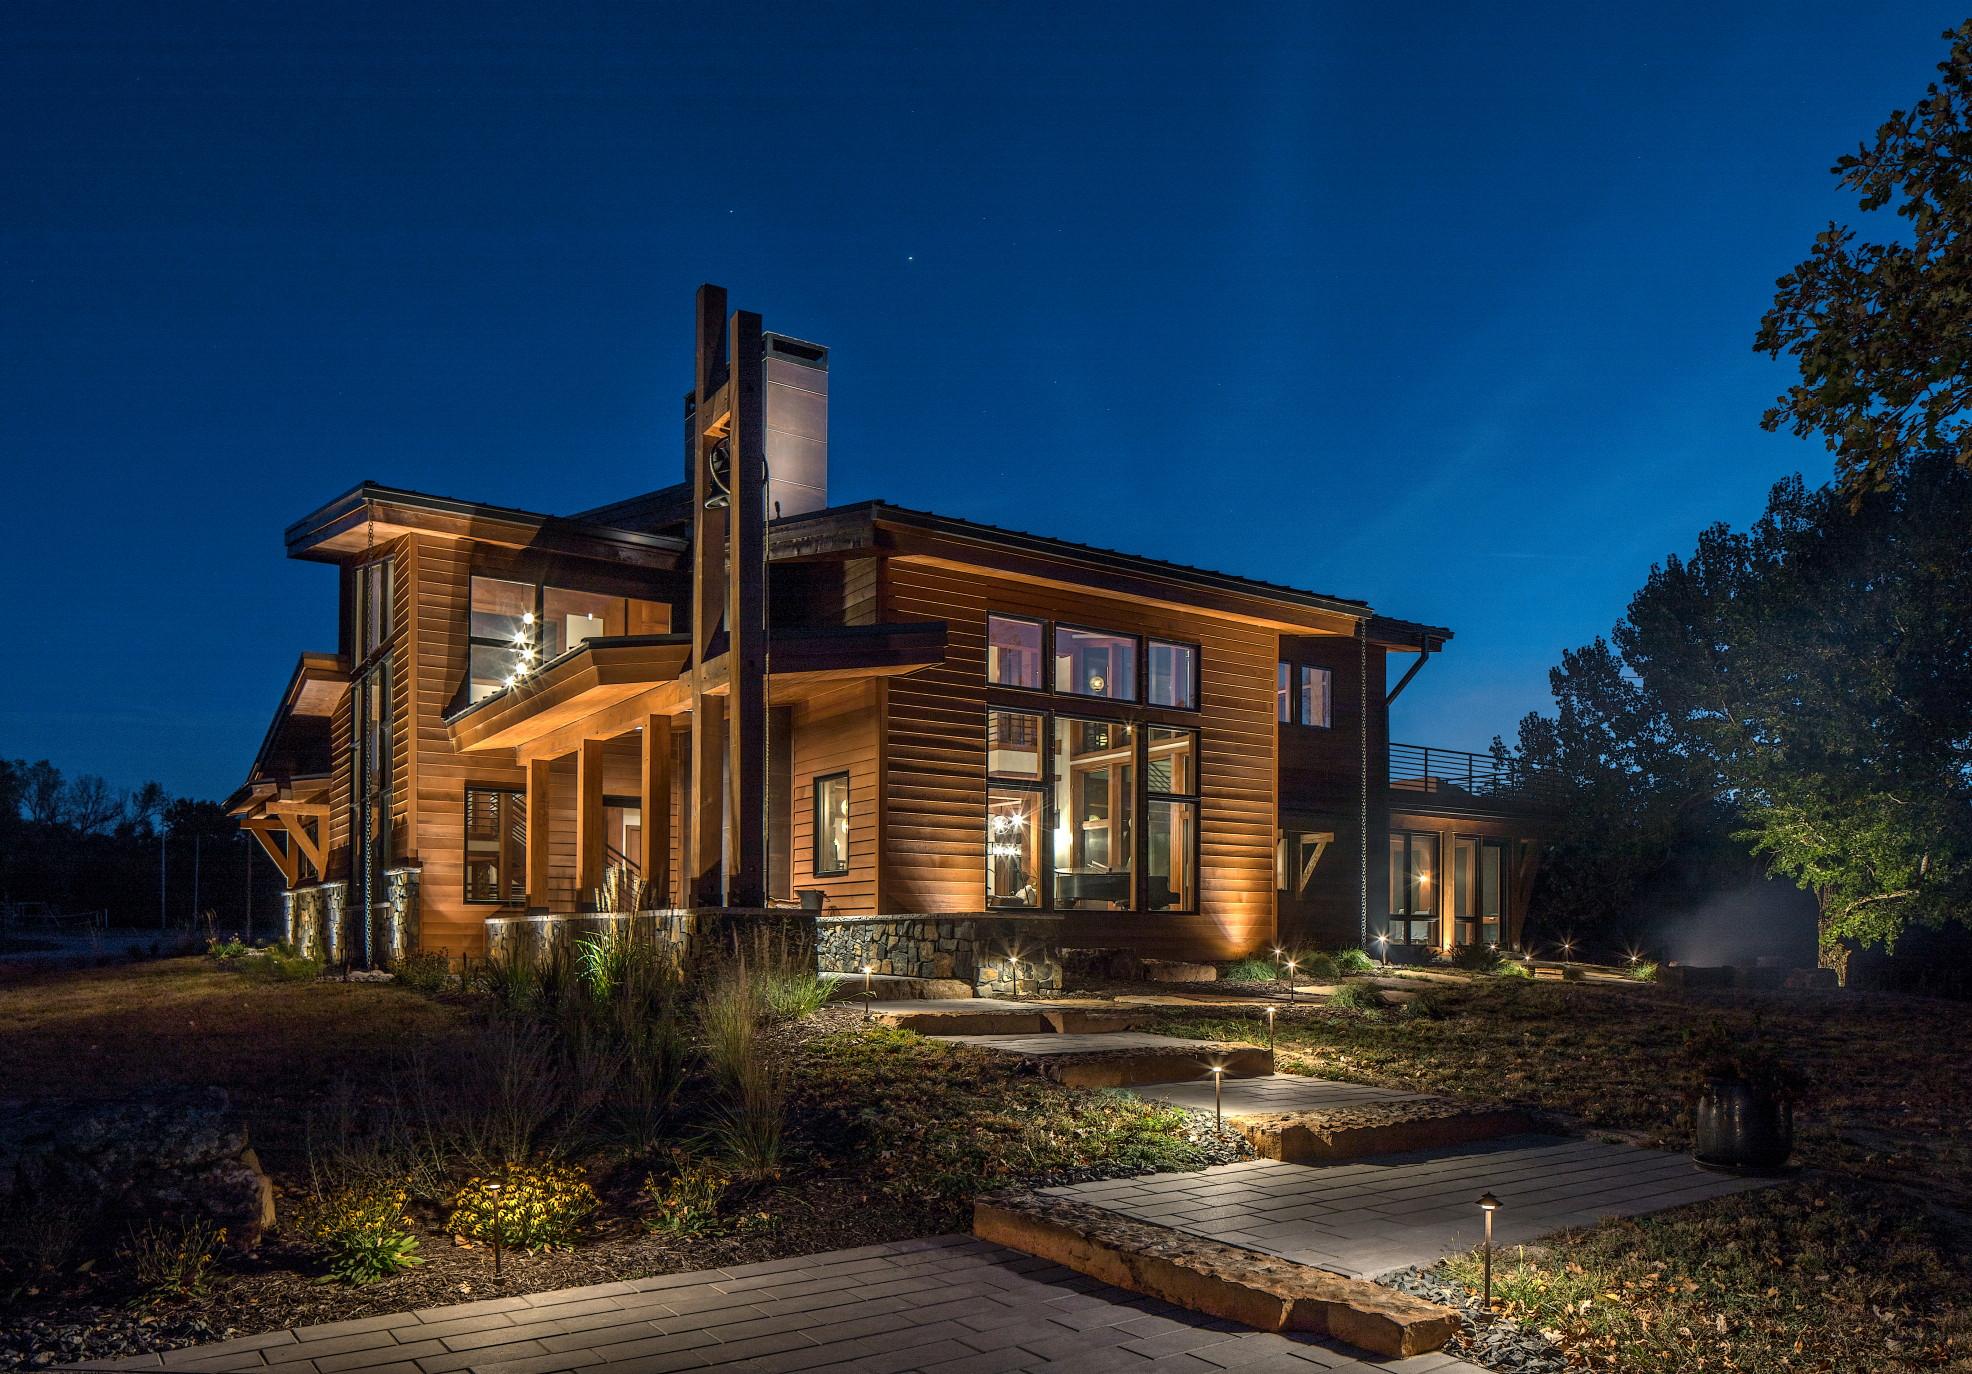 Architectural Landscape Lighting Elkhorn, Nebraska